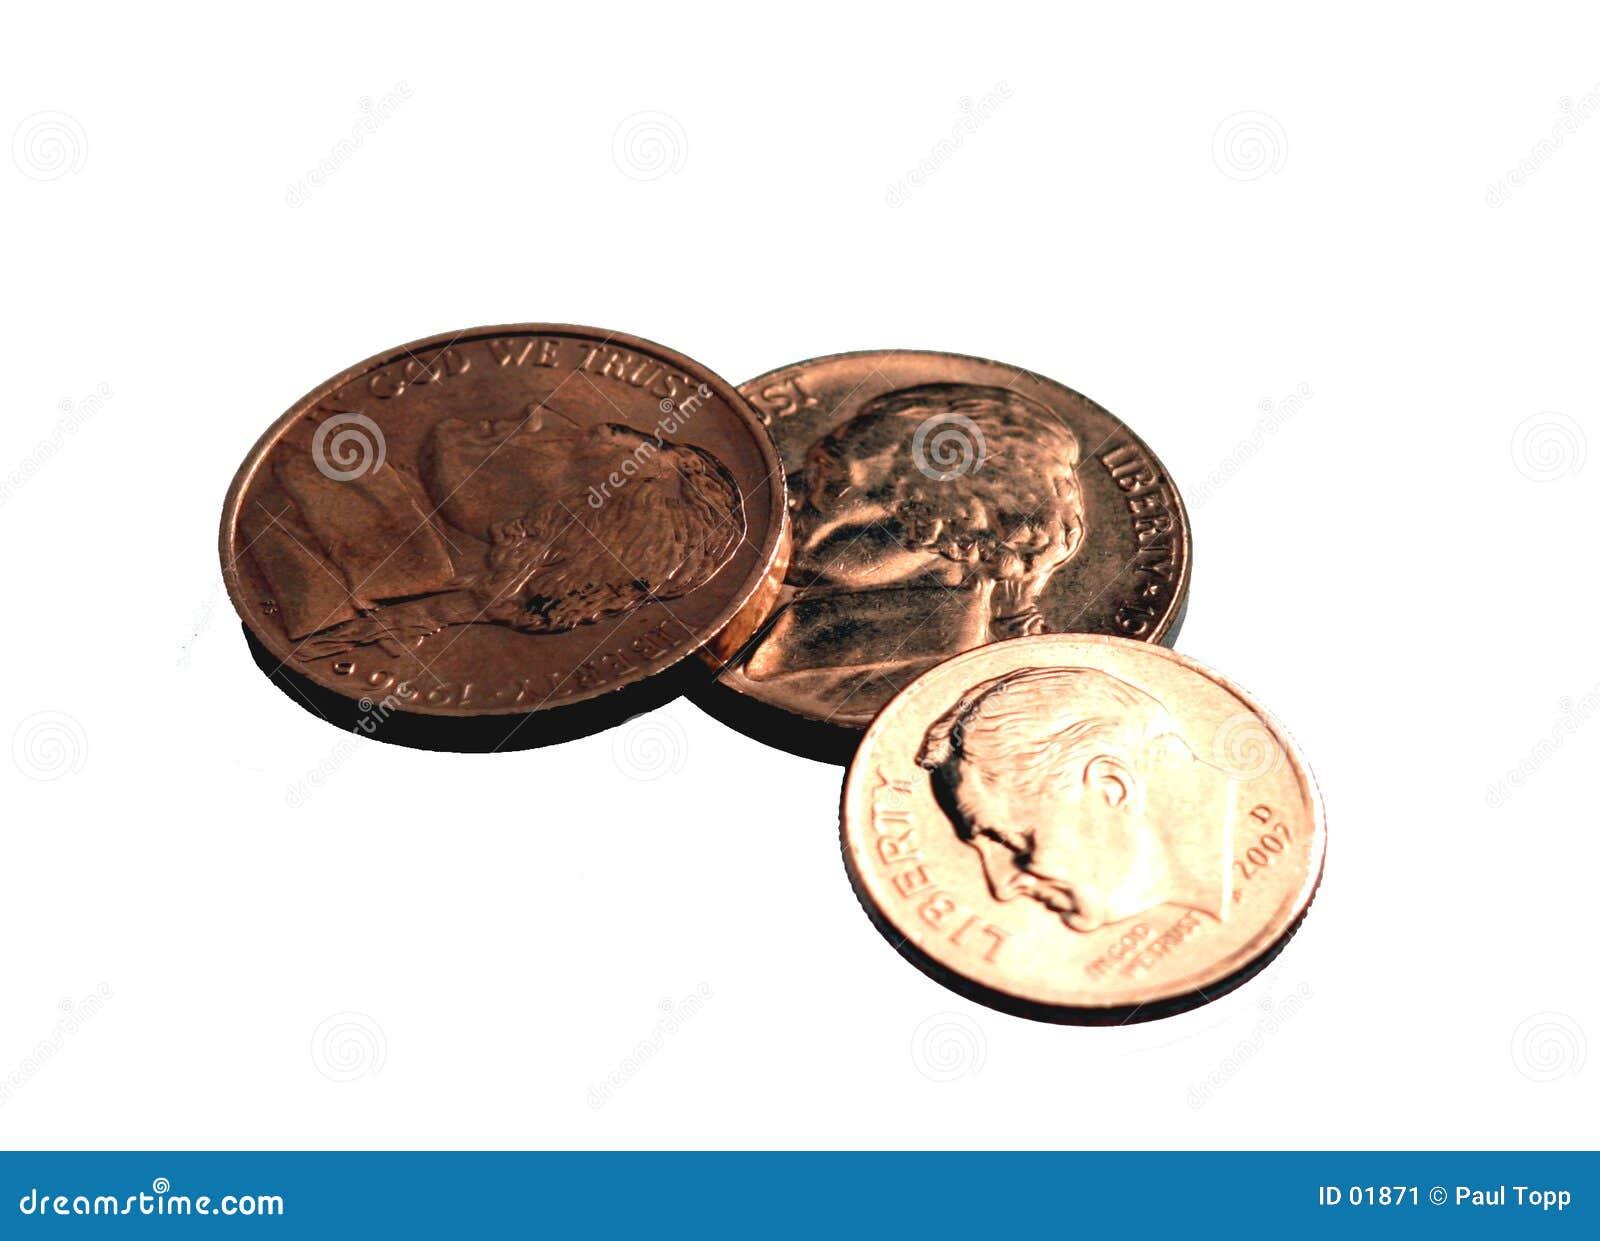 Nichel e moneta da dieci centesimi di dollaro